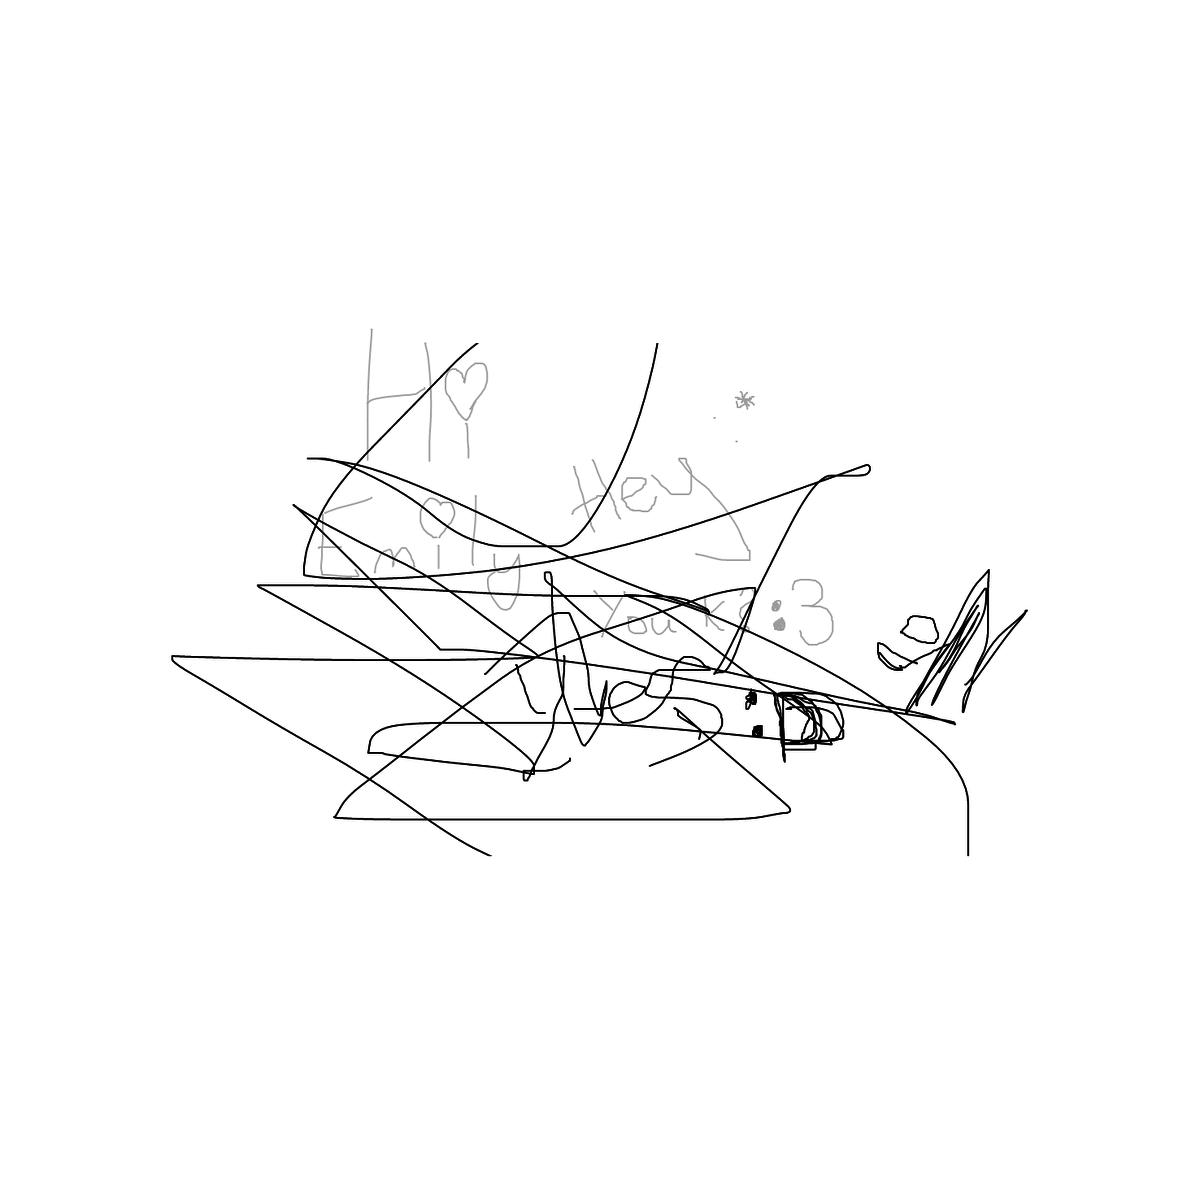 BAAAM drawing#270 lat:51.4957160949707000lng: -2.5086040496826170